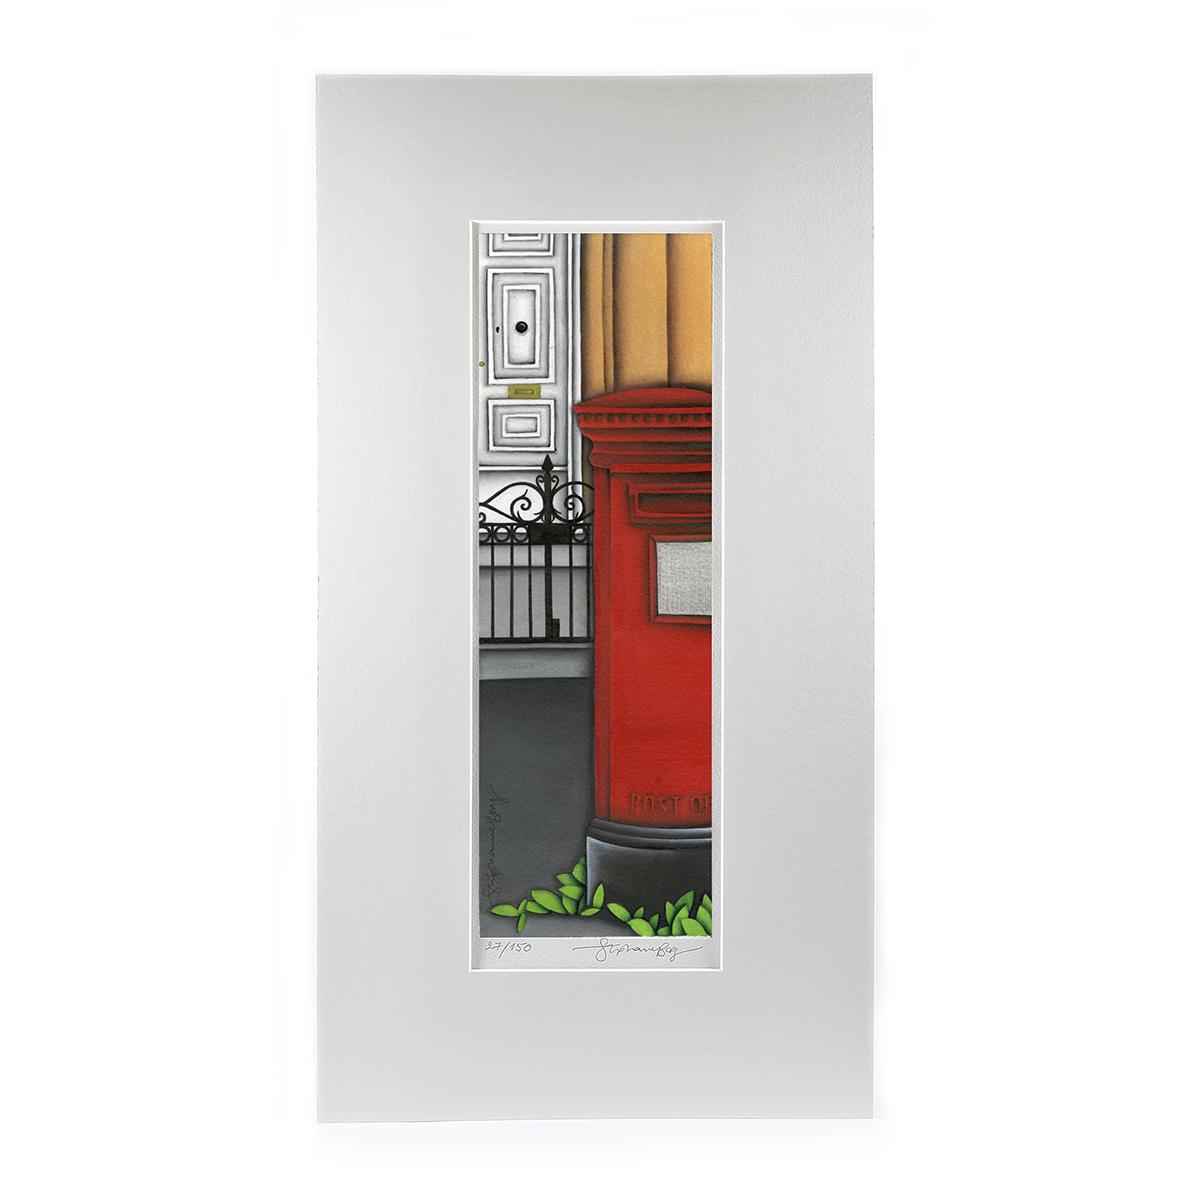 The Red Pillar Box